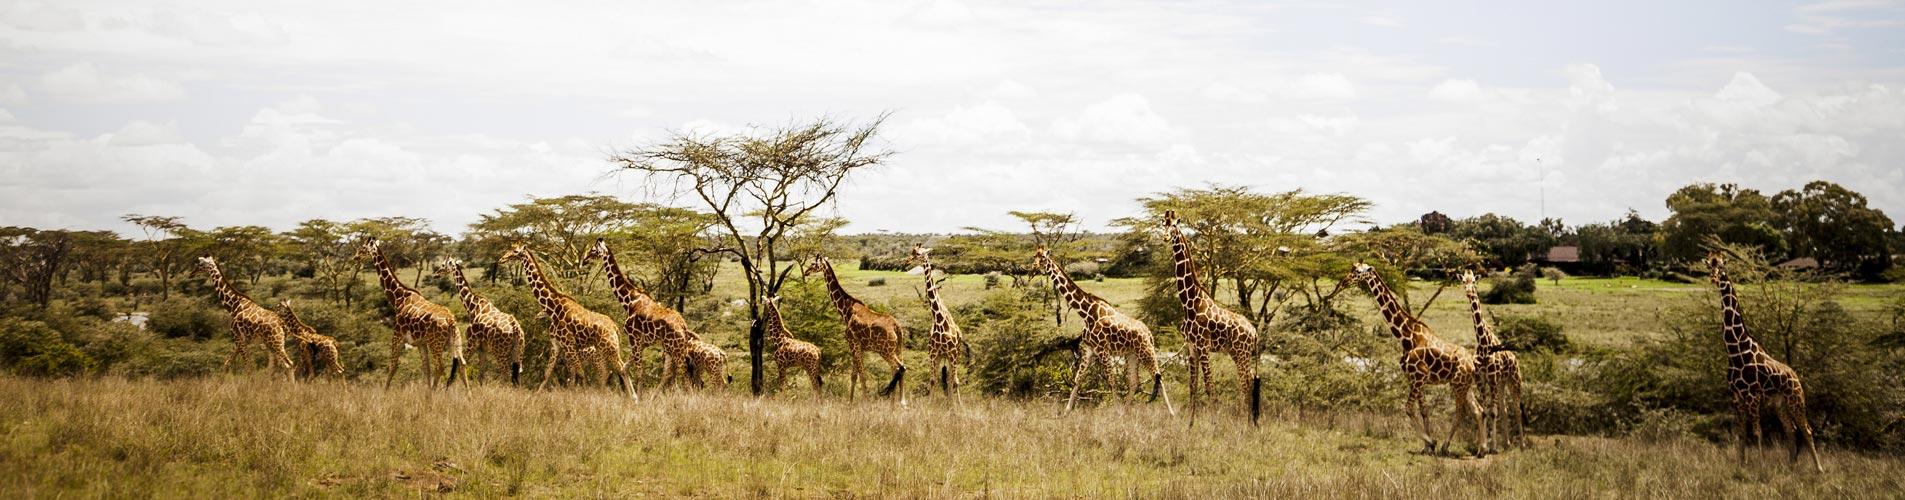 Segera Giraffes in Kenya